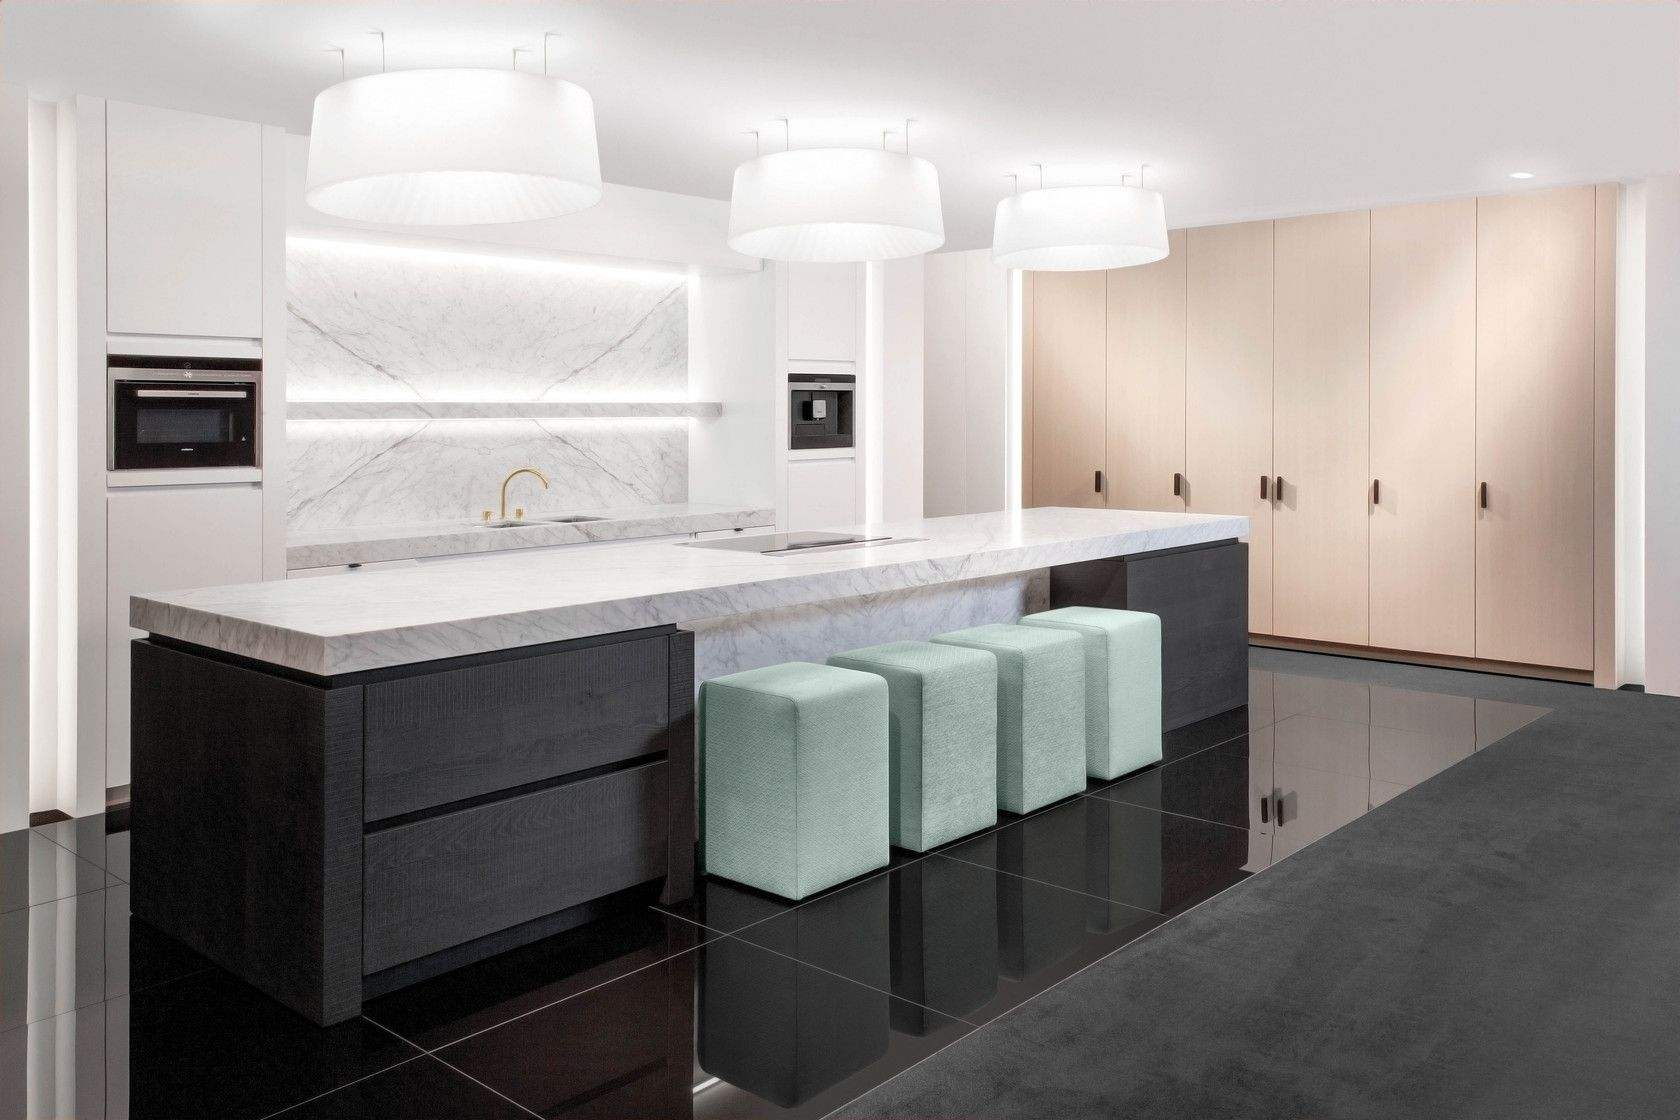 Goedkope Design Keuken : Trybou keuken keukens interieur maatwerk betrouwbare keukens